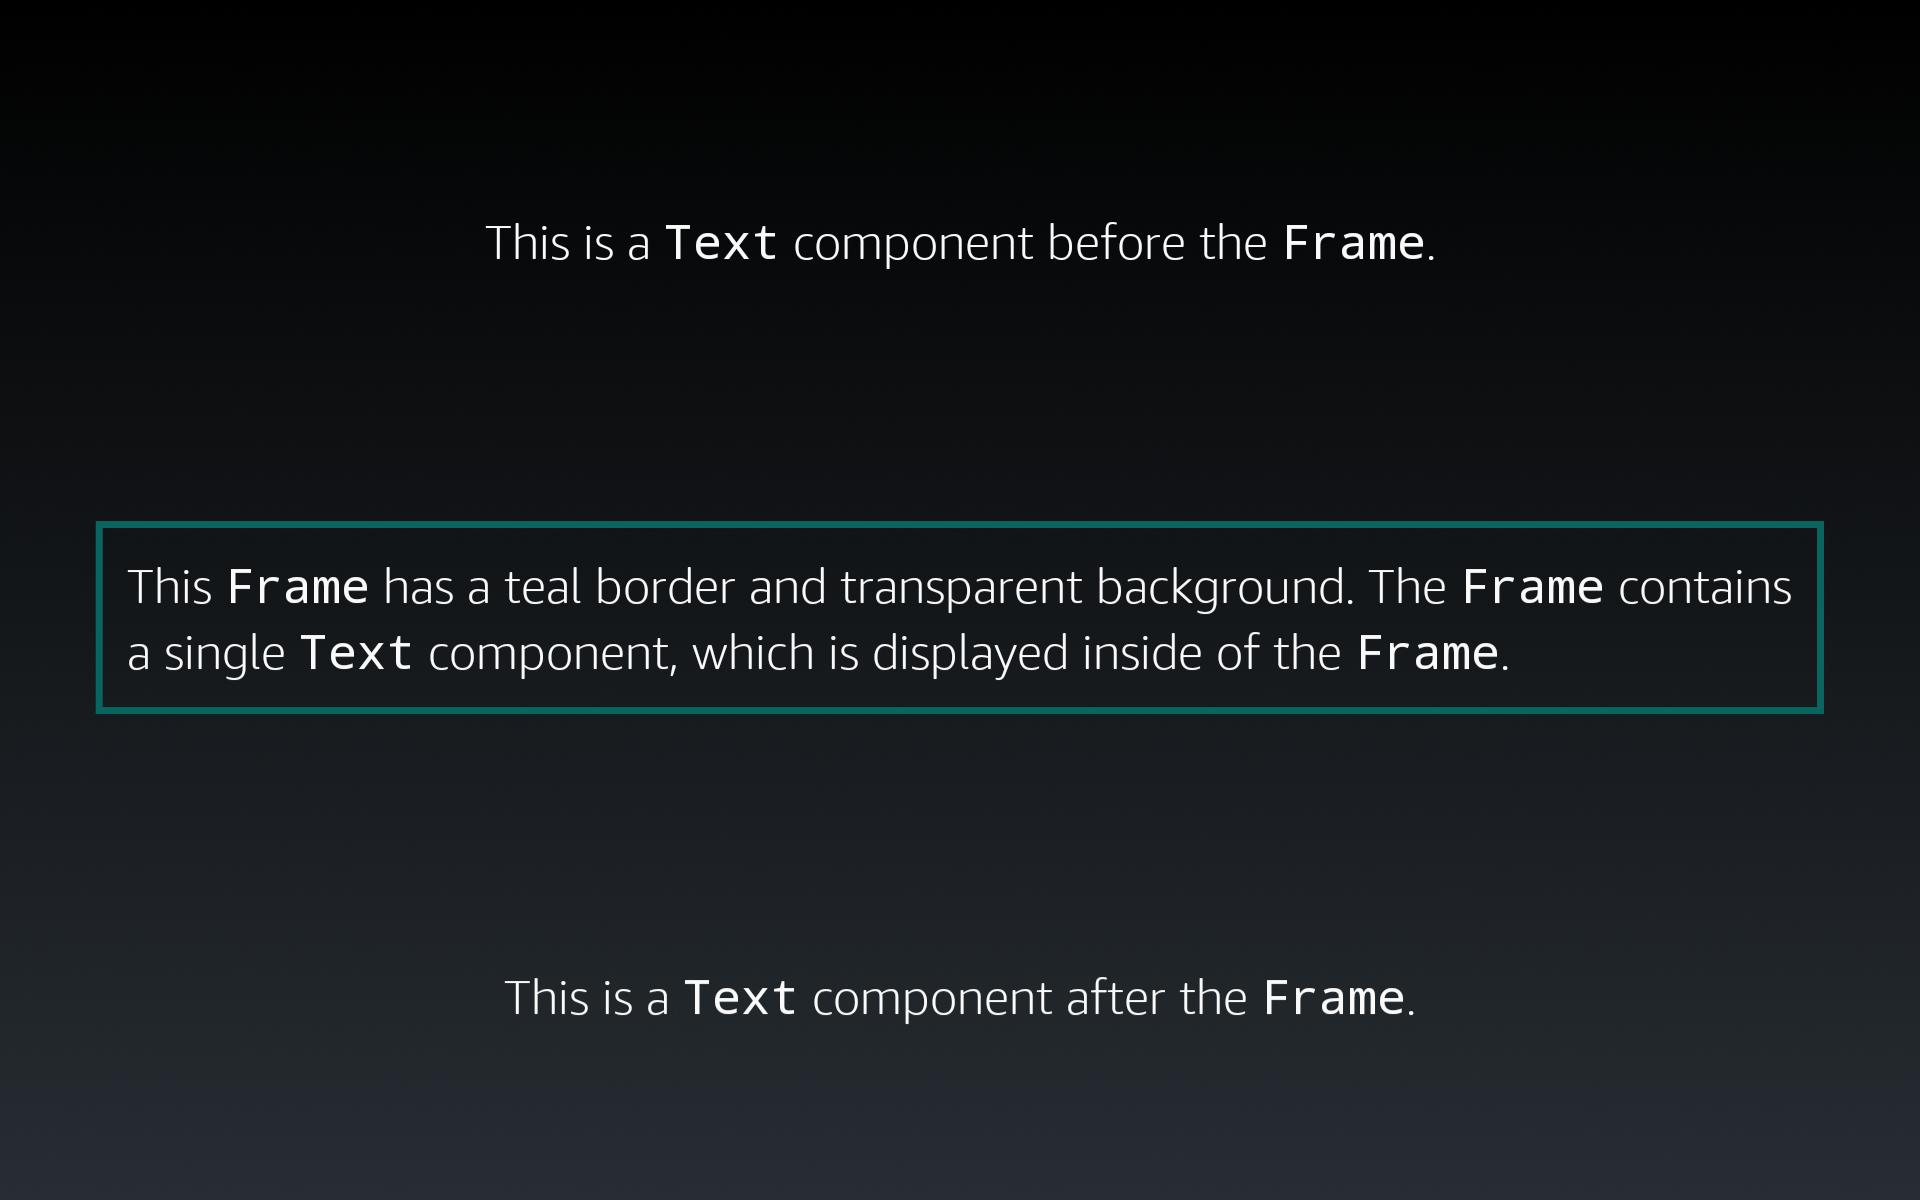 Textコンポーネントの周囲に表示される境界線